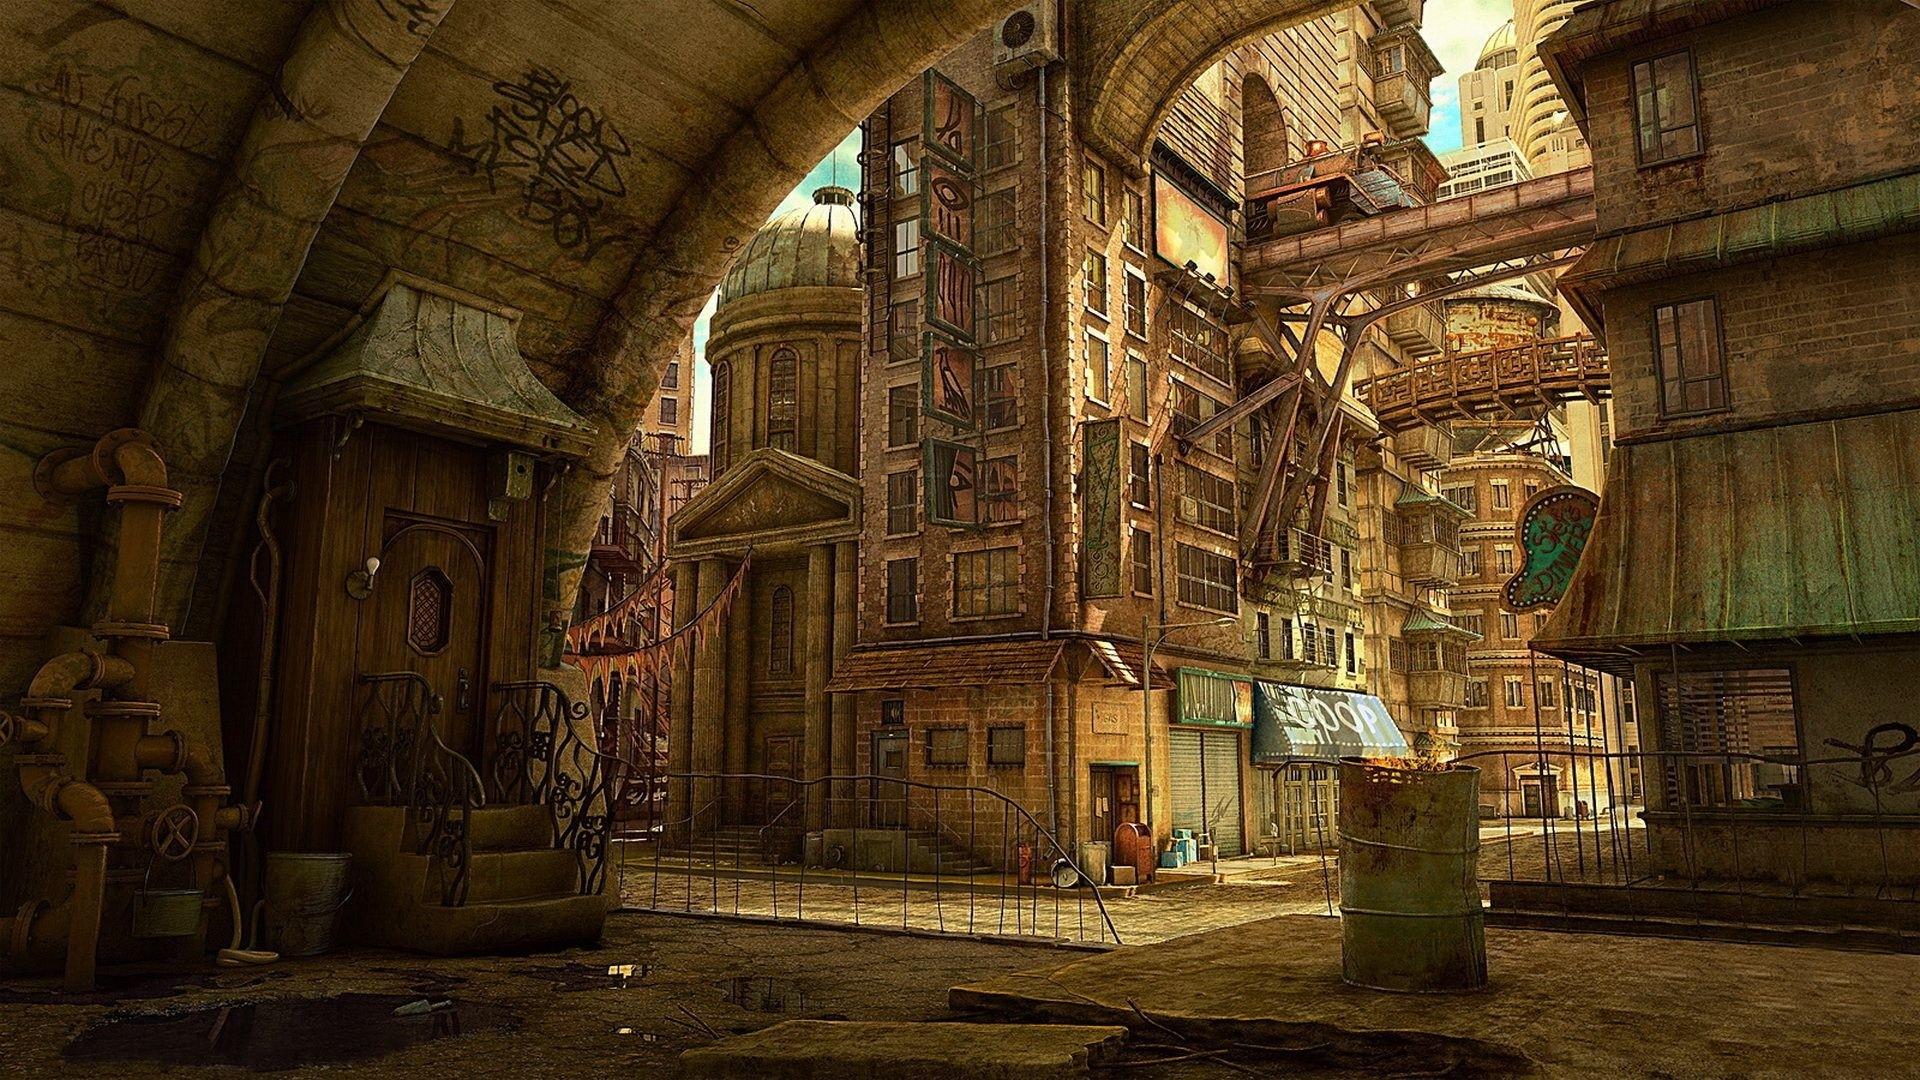 Steampunk wallpaper photo hd